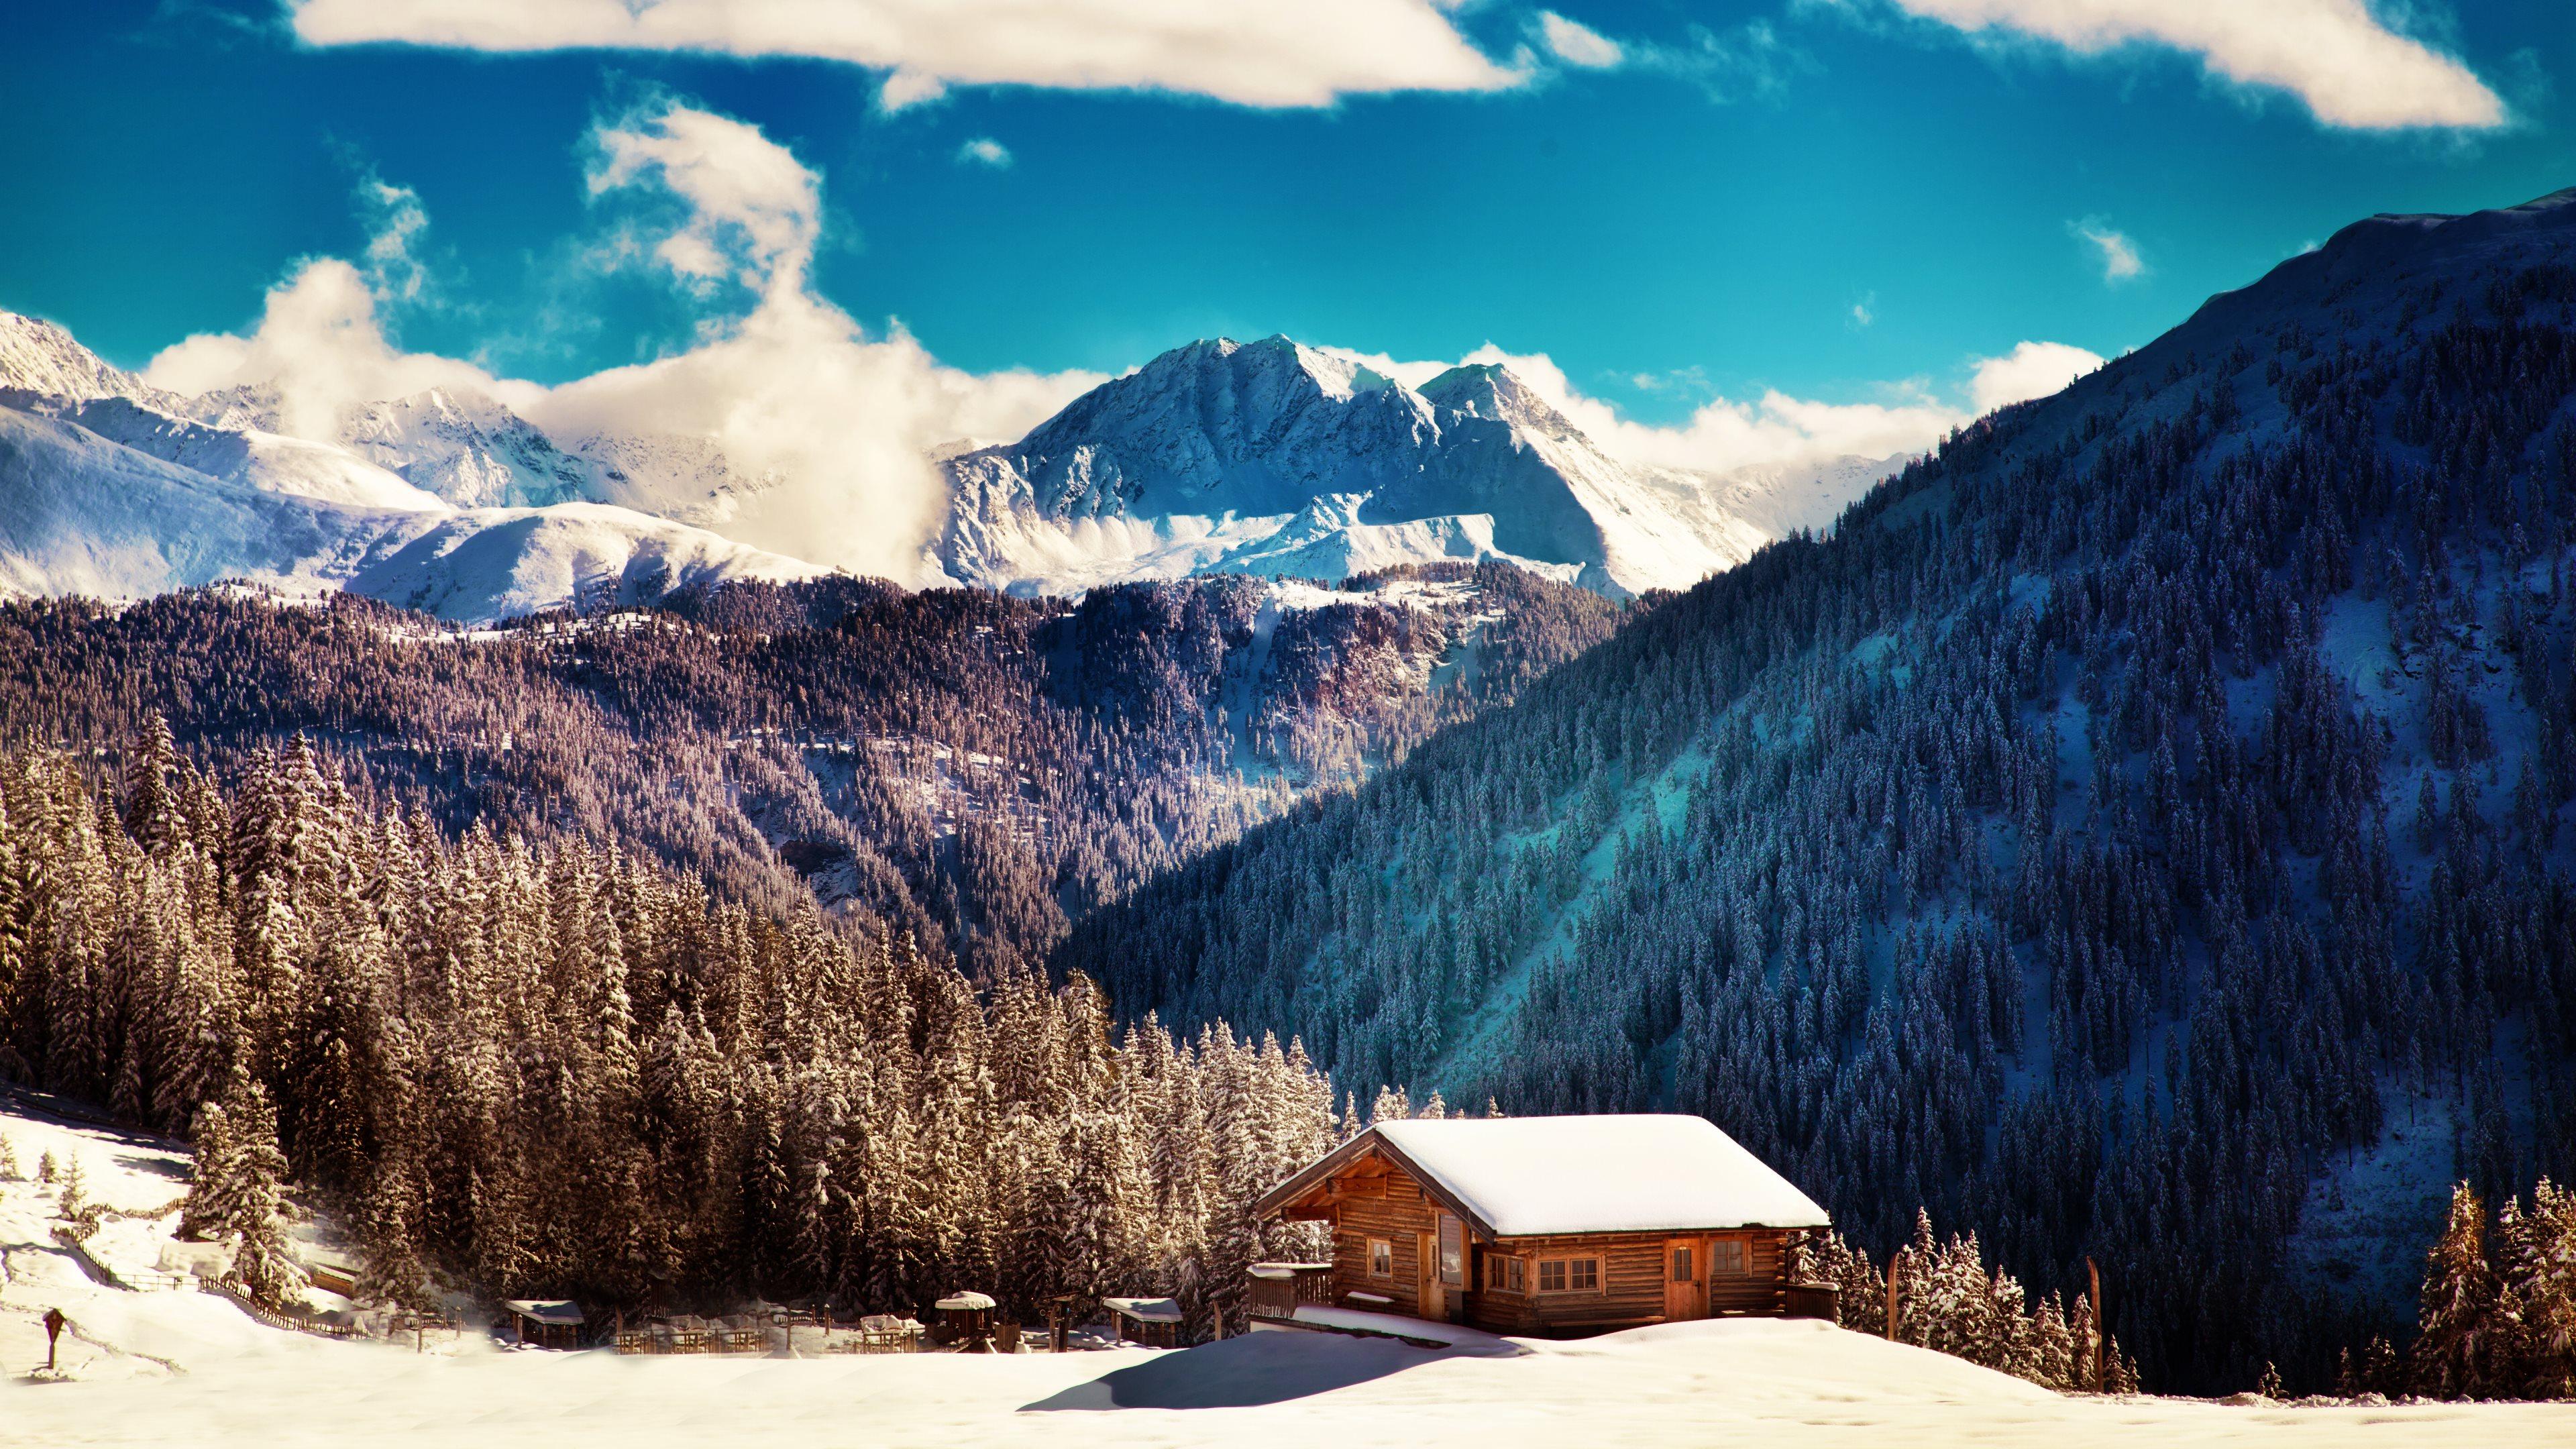 Ultra 4K Wallpaper 5 Winter nature in Tirol 3840x2160